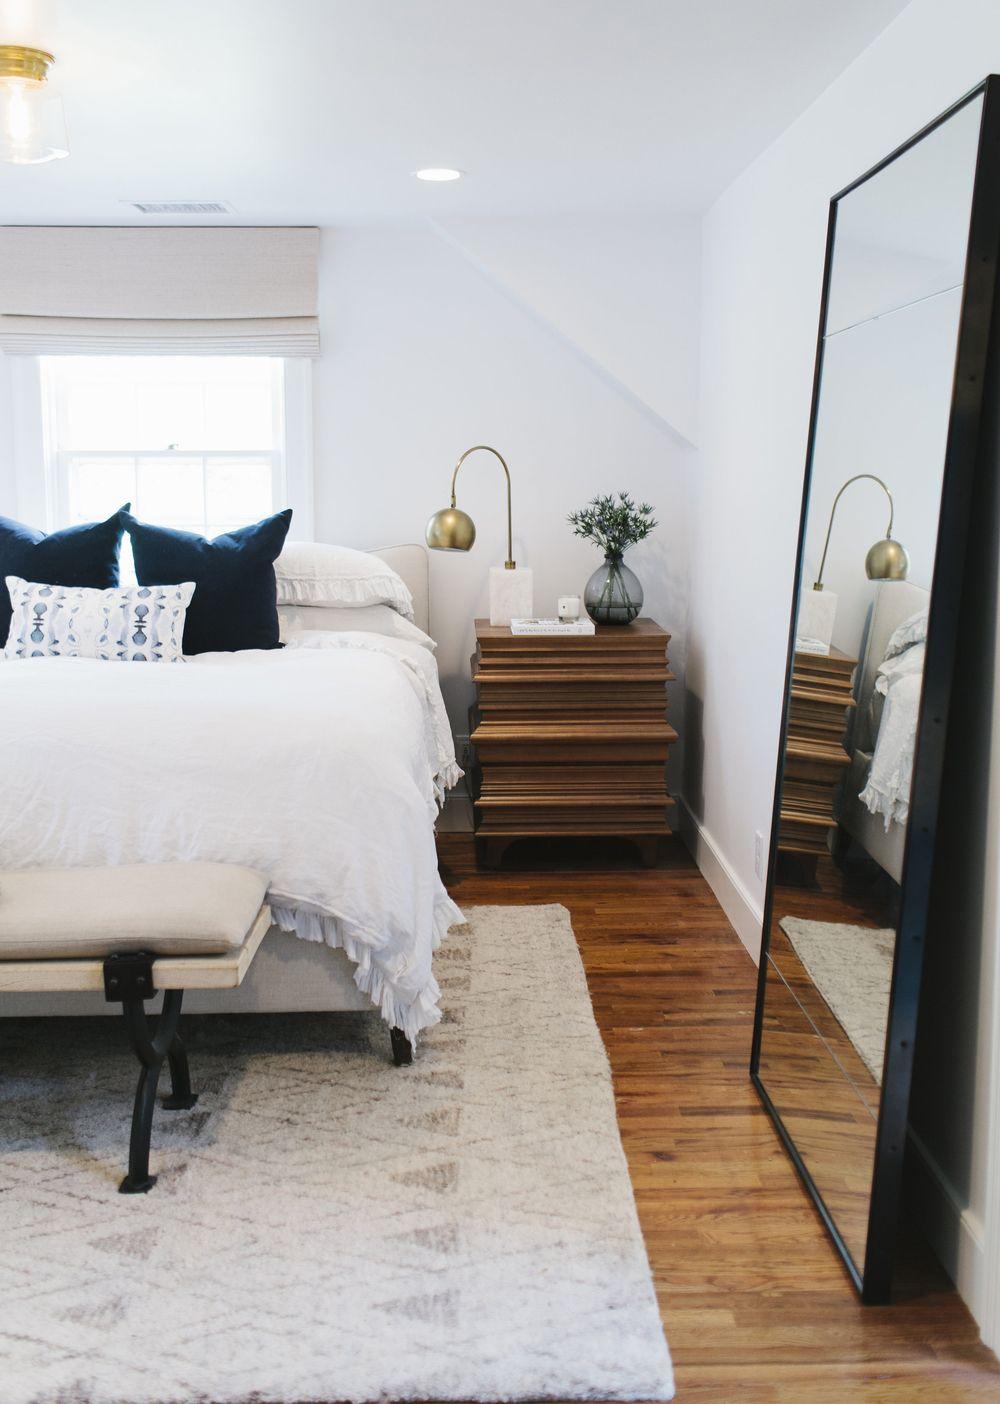 Master bedroom huge  Lynwood Remodel Master Bedroom and Bath  Inspire Me  Pinterest